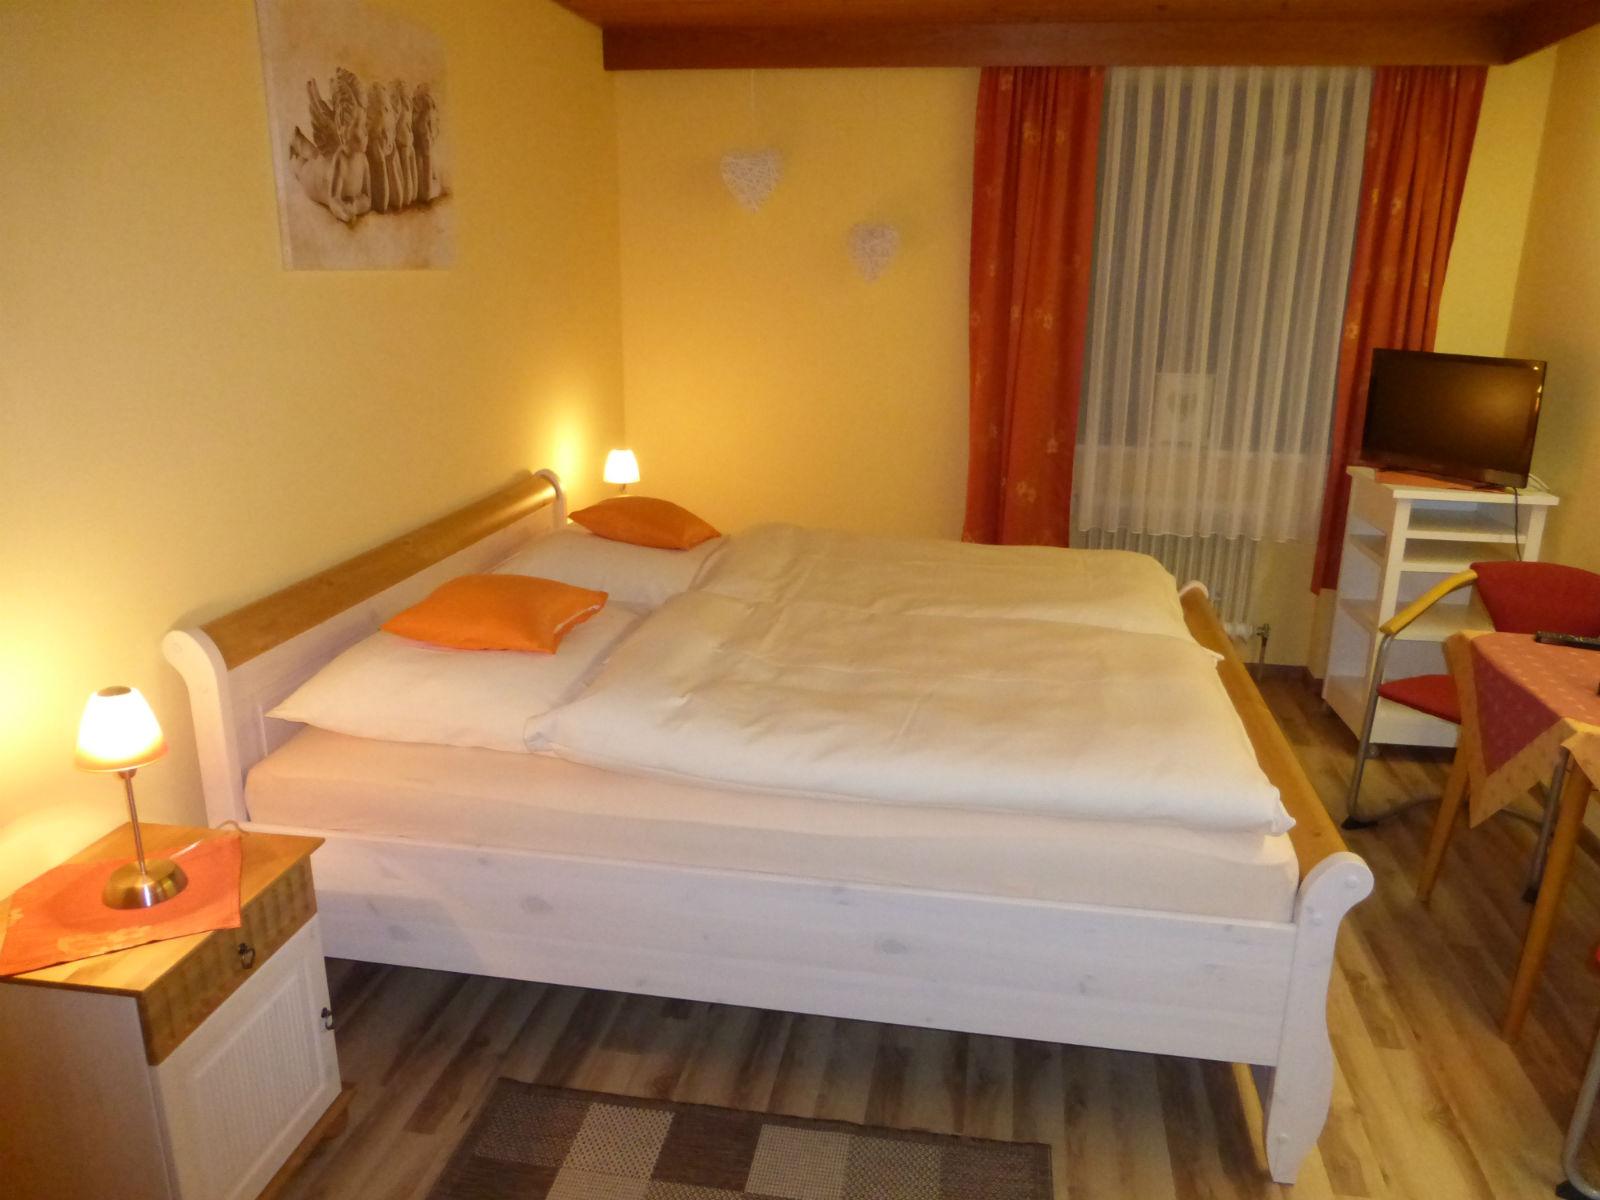 Hammerschmiede-Zimmer-Schlafzimmer-05